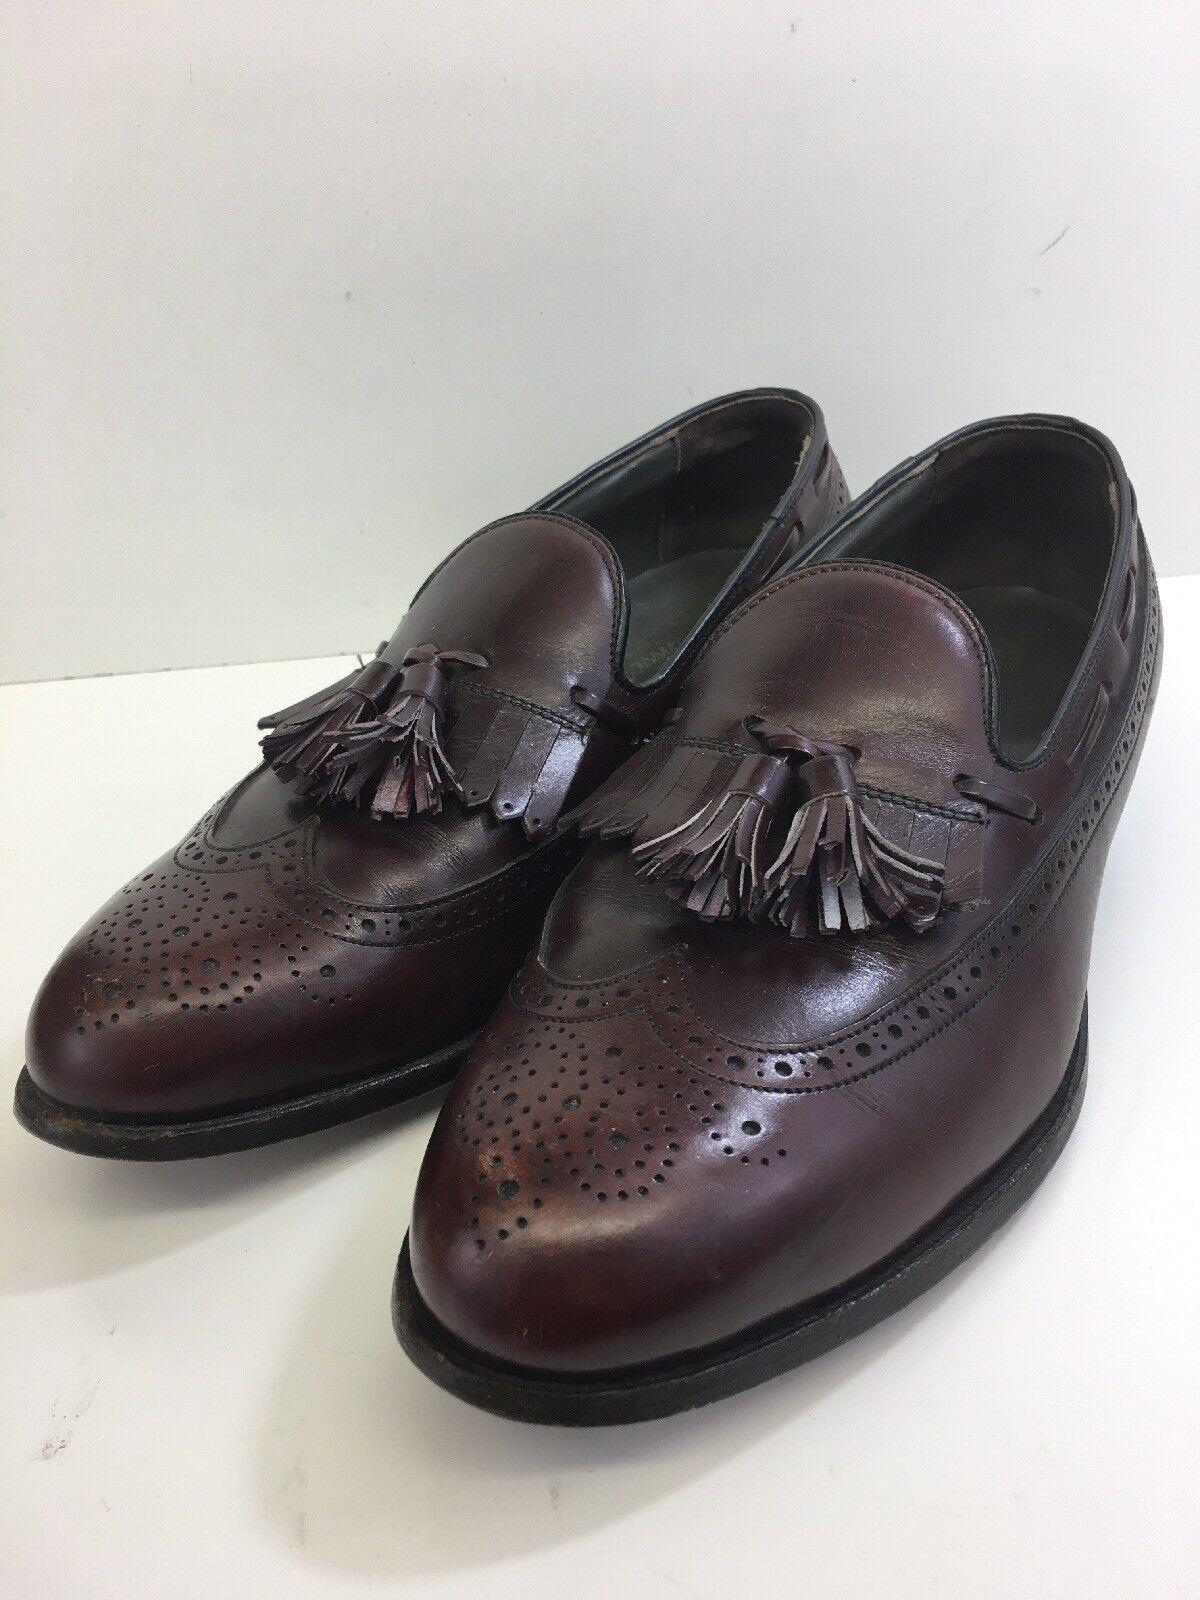 Footjoy  Loafers  Tassel Burgundy Dress shoes Brogue Leather Men's Size 8.5 D